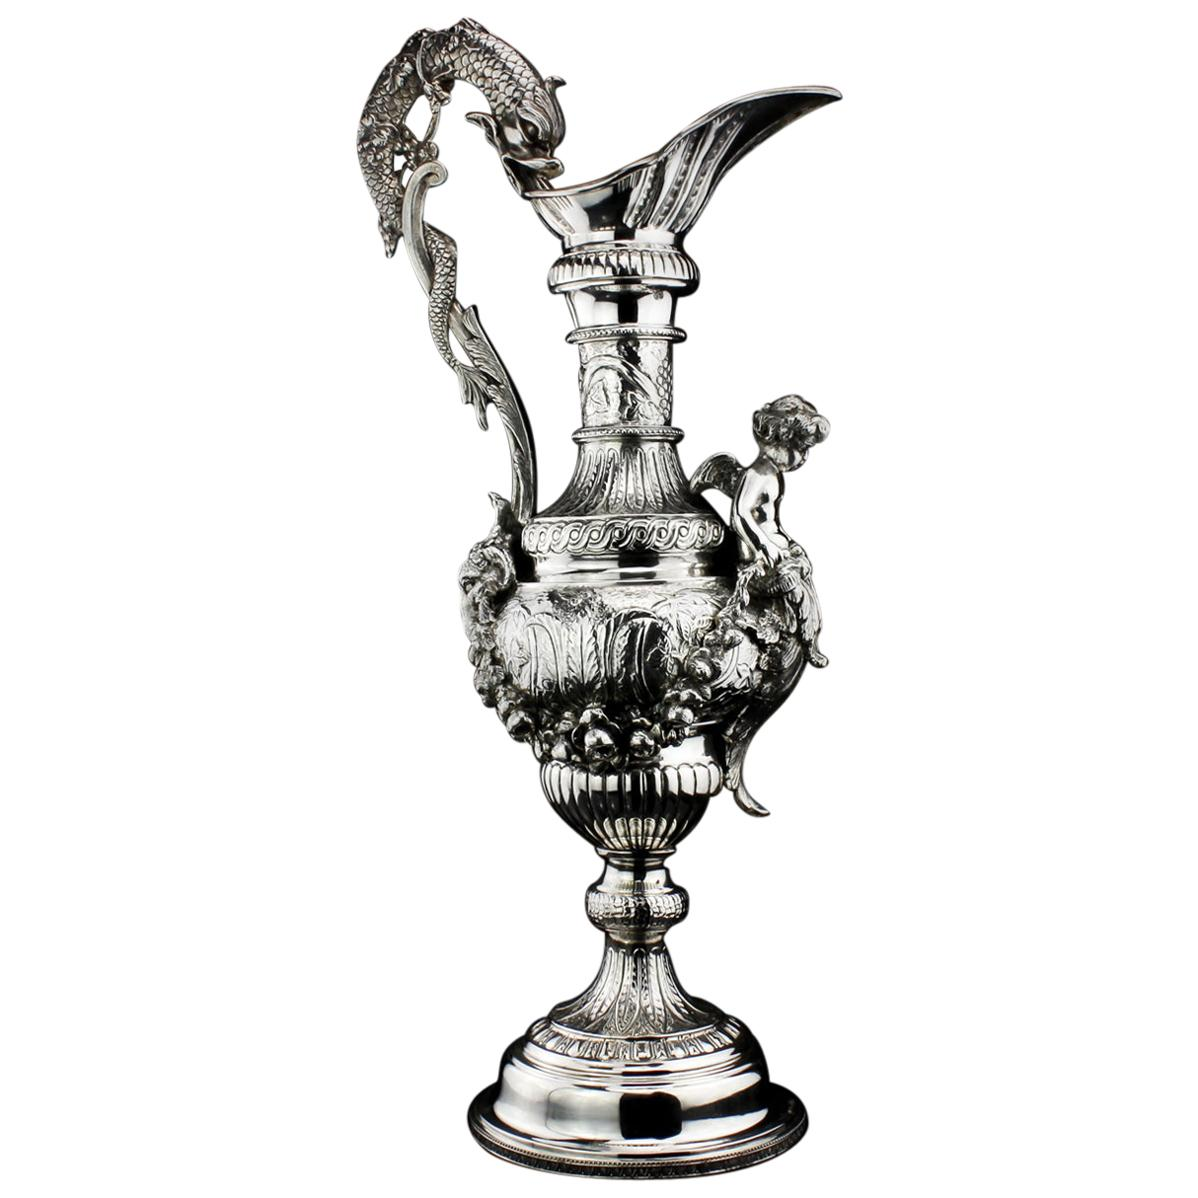 Buccelatti Antique Silver Wine Ewer, Made in Italy, circa 1900